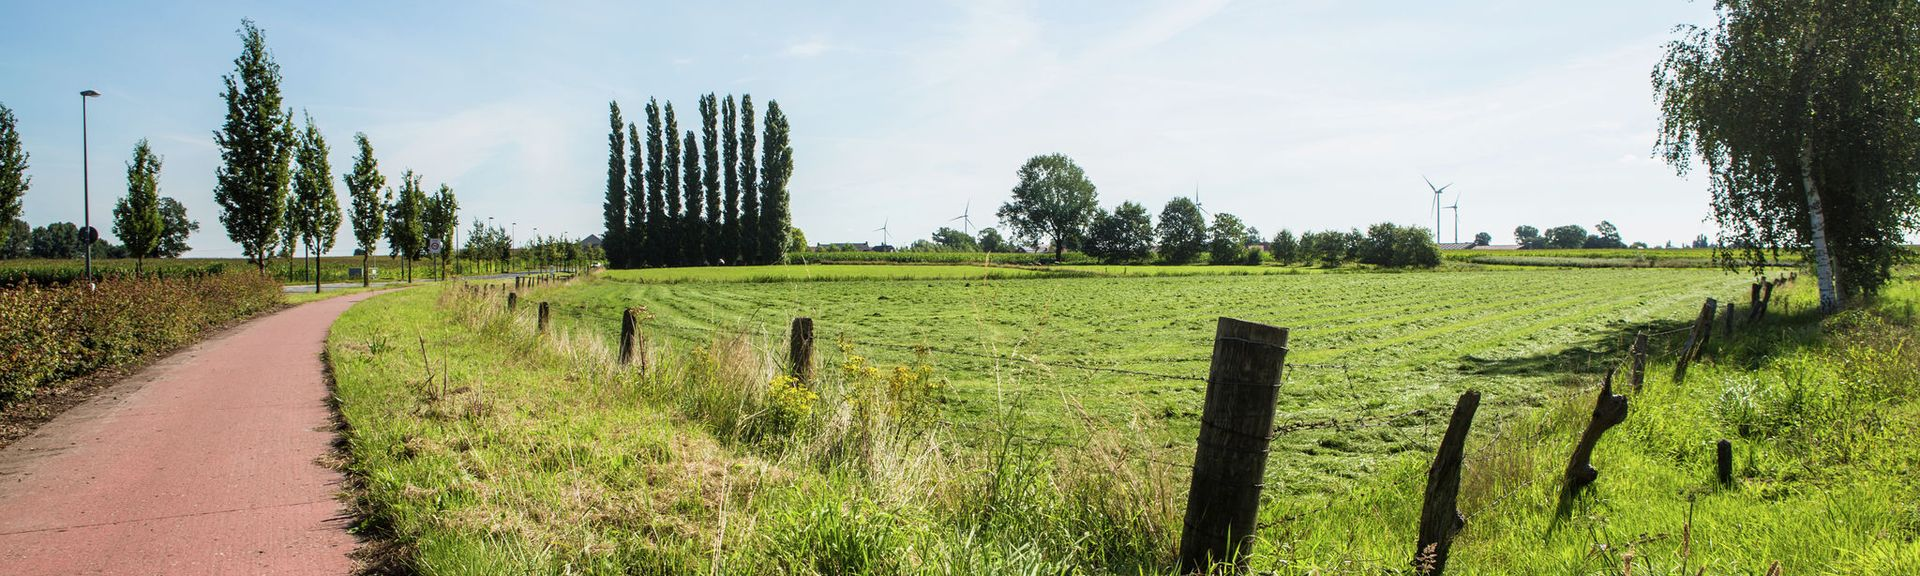 Merksplas, Den Flamske Region, belgien